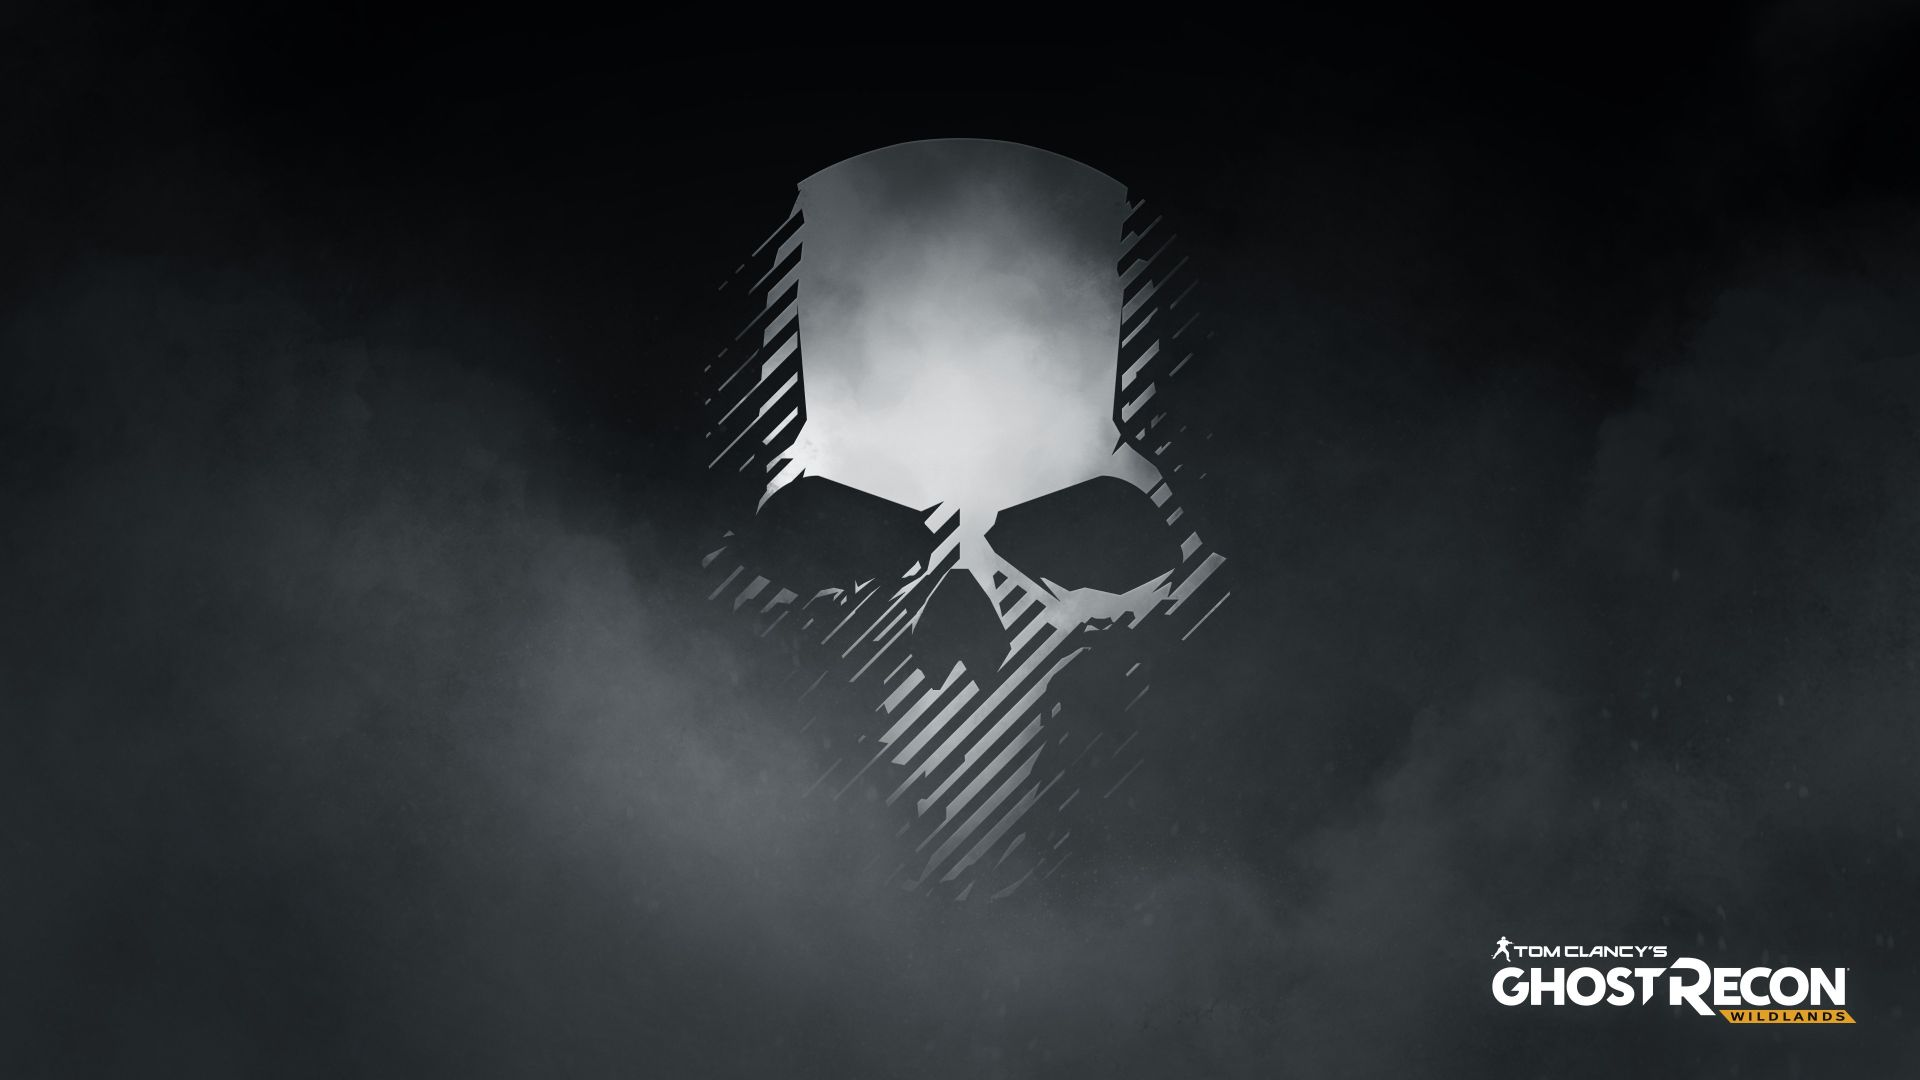 Tom Clancy's Ghost Recon Wildlands - E3 Reveal Trailer ...  Skull Ghost Recon Wildlands